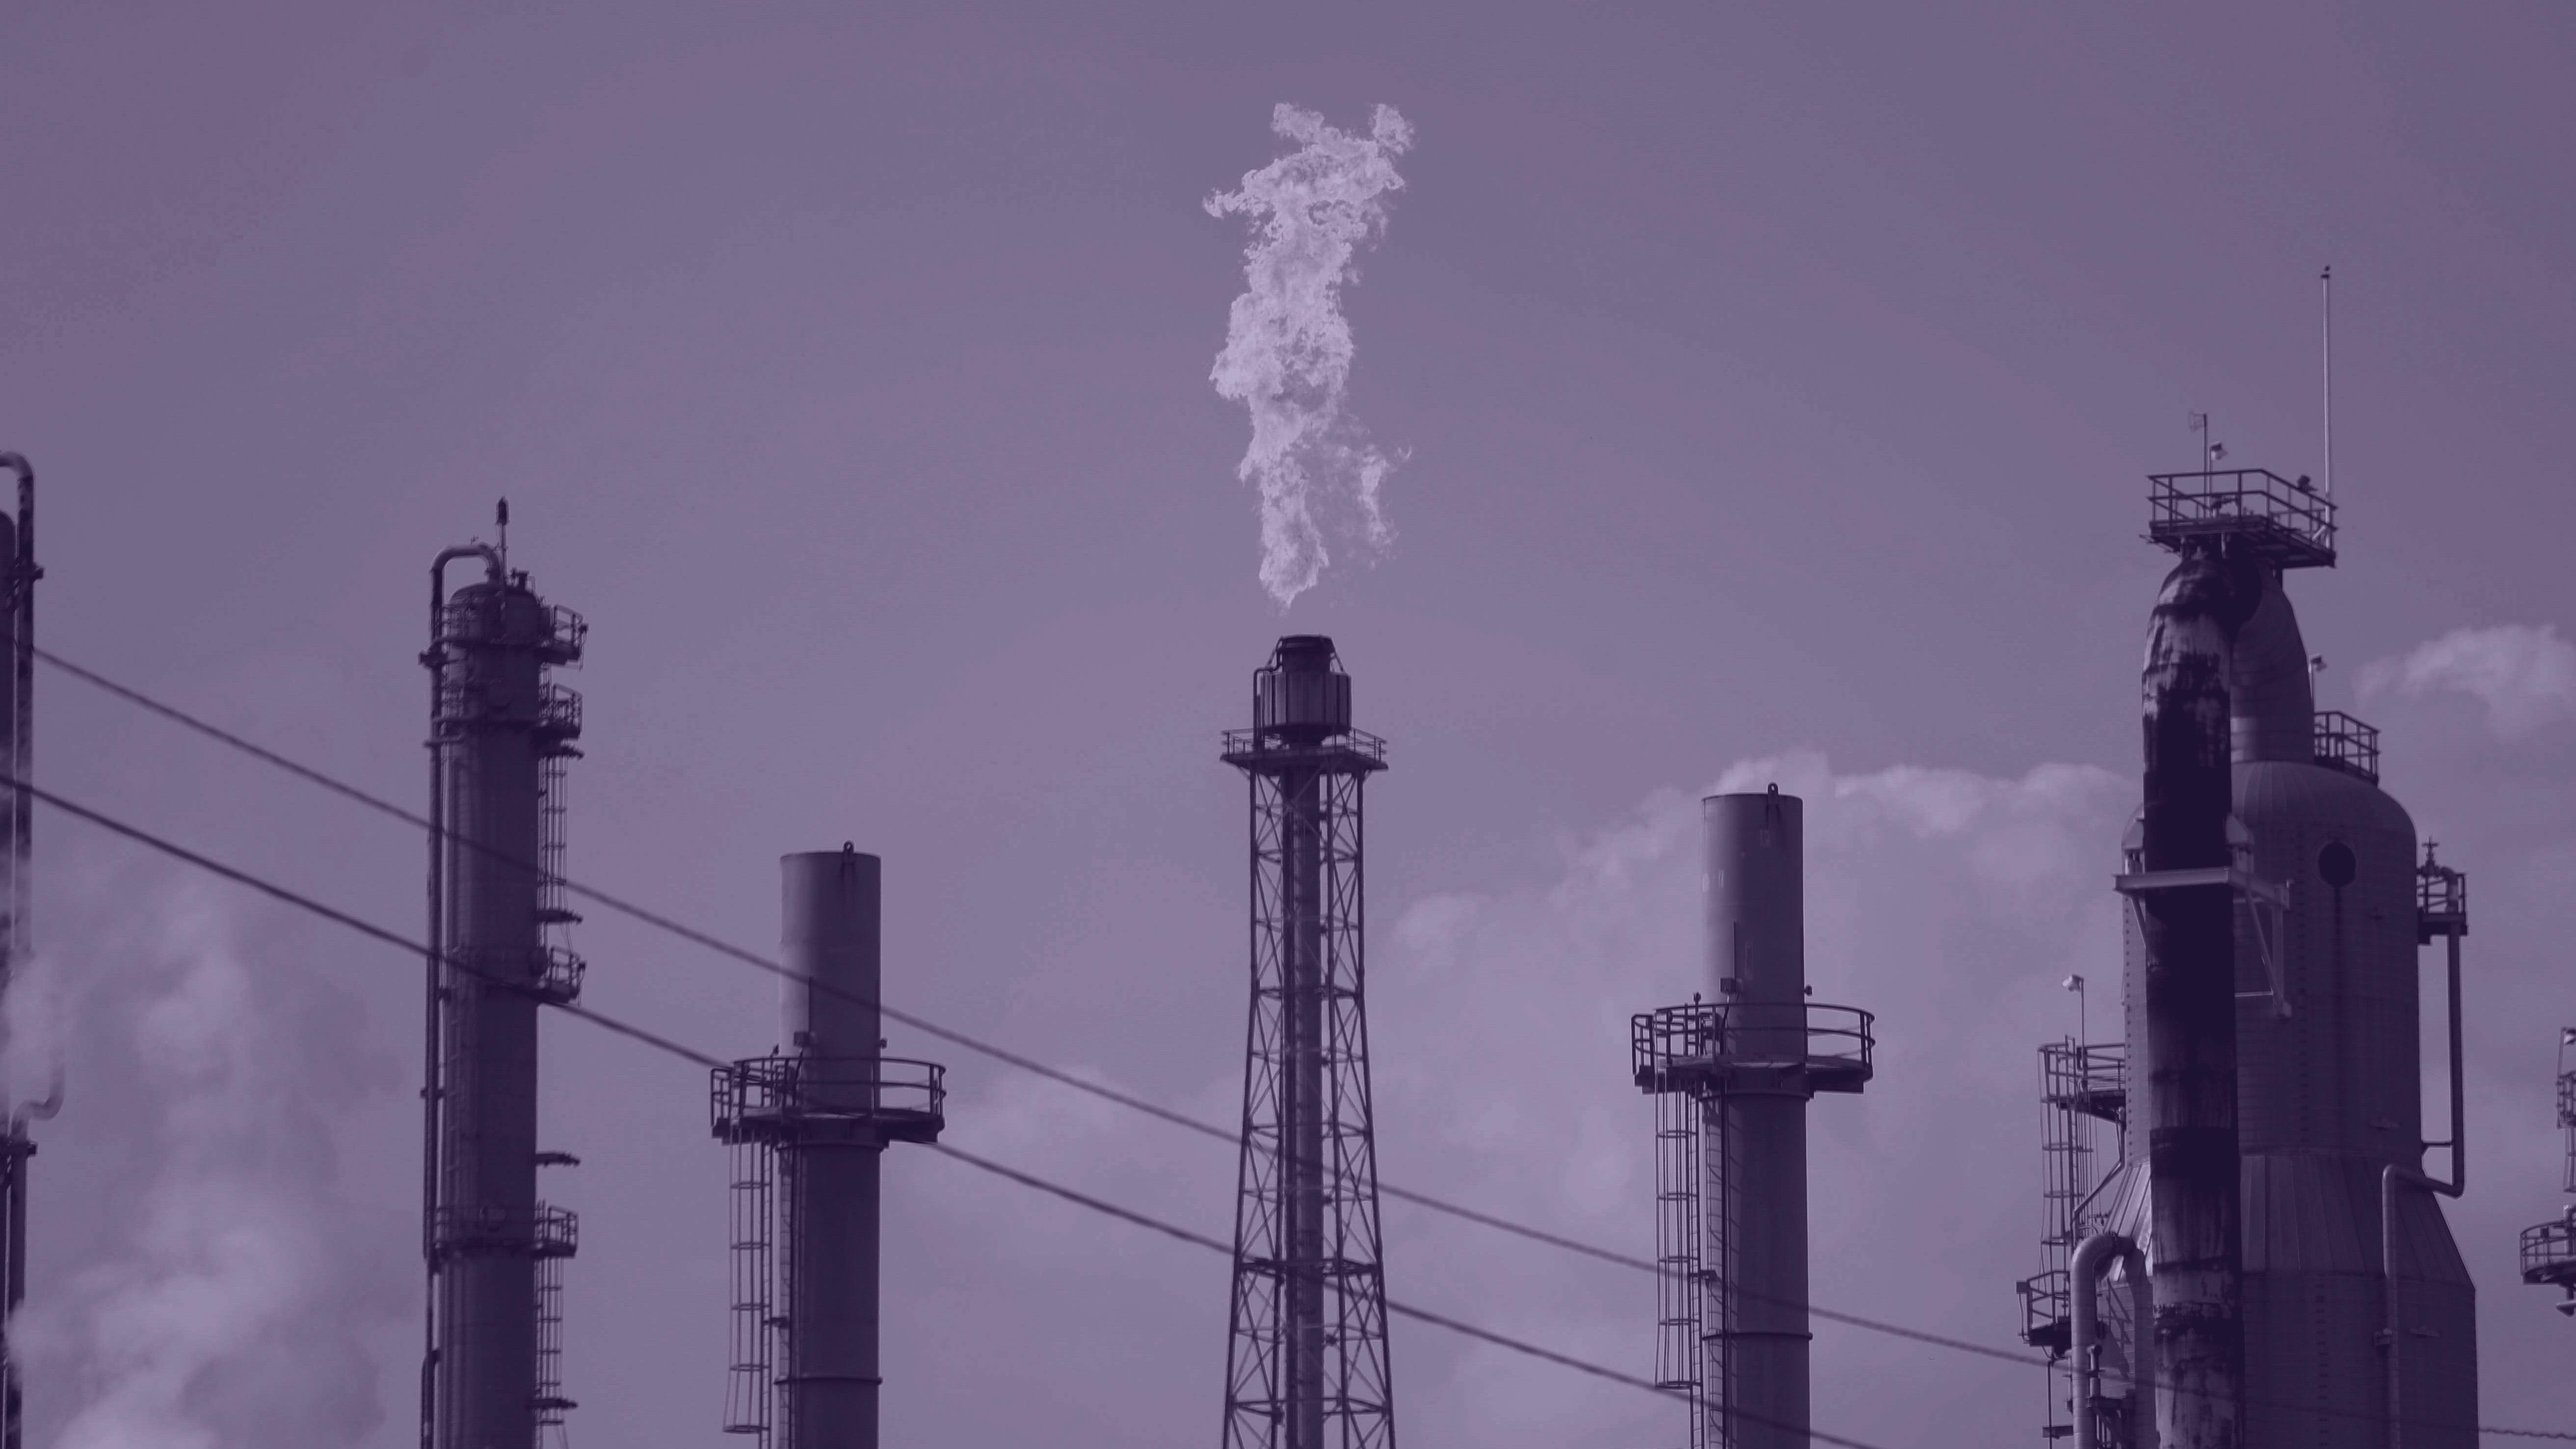 Shell Deer Park oil refinery in Deer Park, Texas